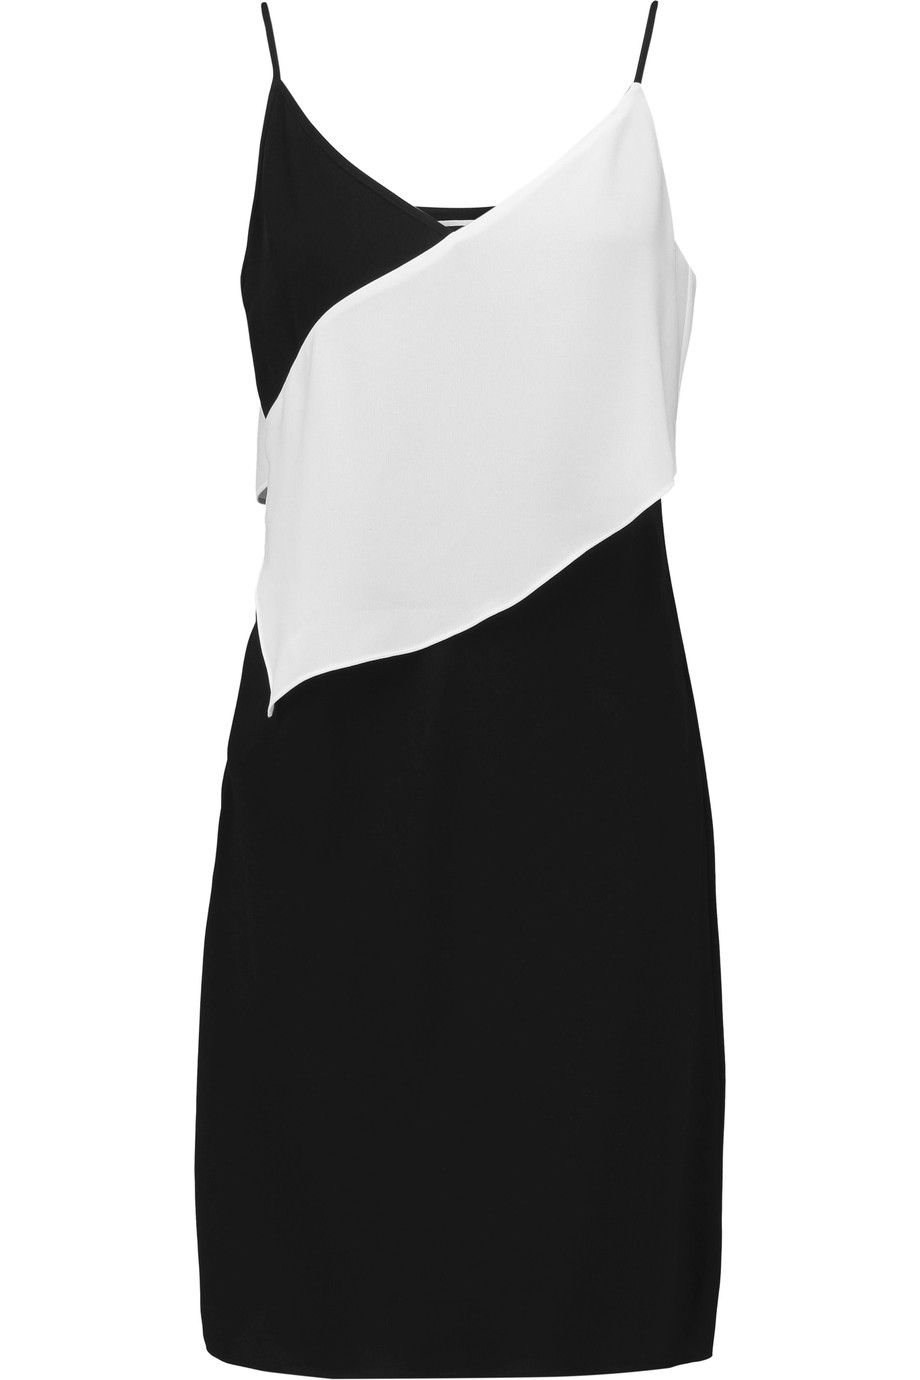 84f208ba2ab65 MCQ BY ALEXANDER MCQUEEN Two-Tone Ruffled Crepe Mini Dress.  #mcqbyalexandermcqueen #cloth #dress